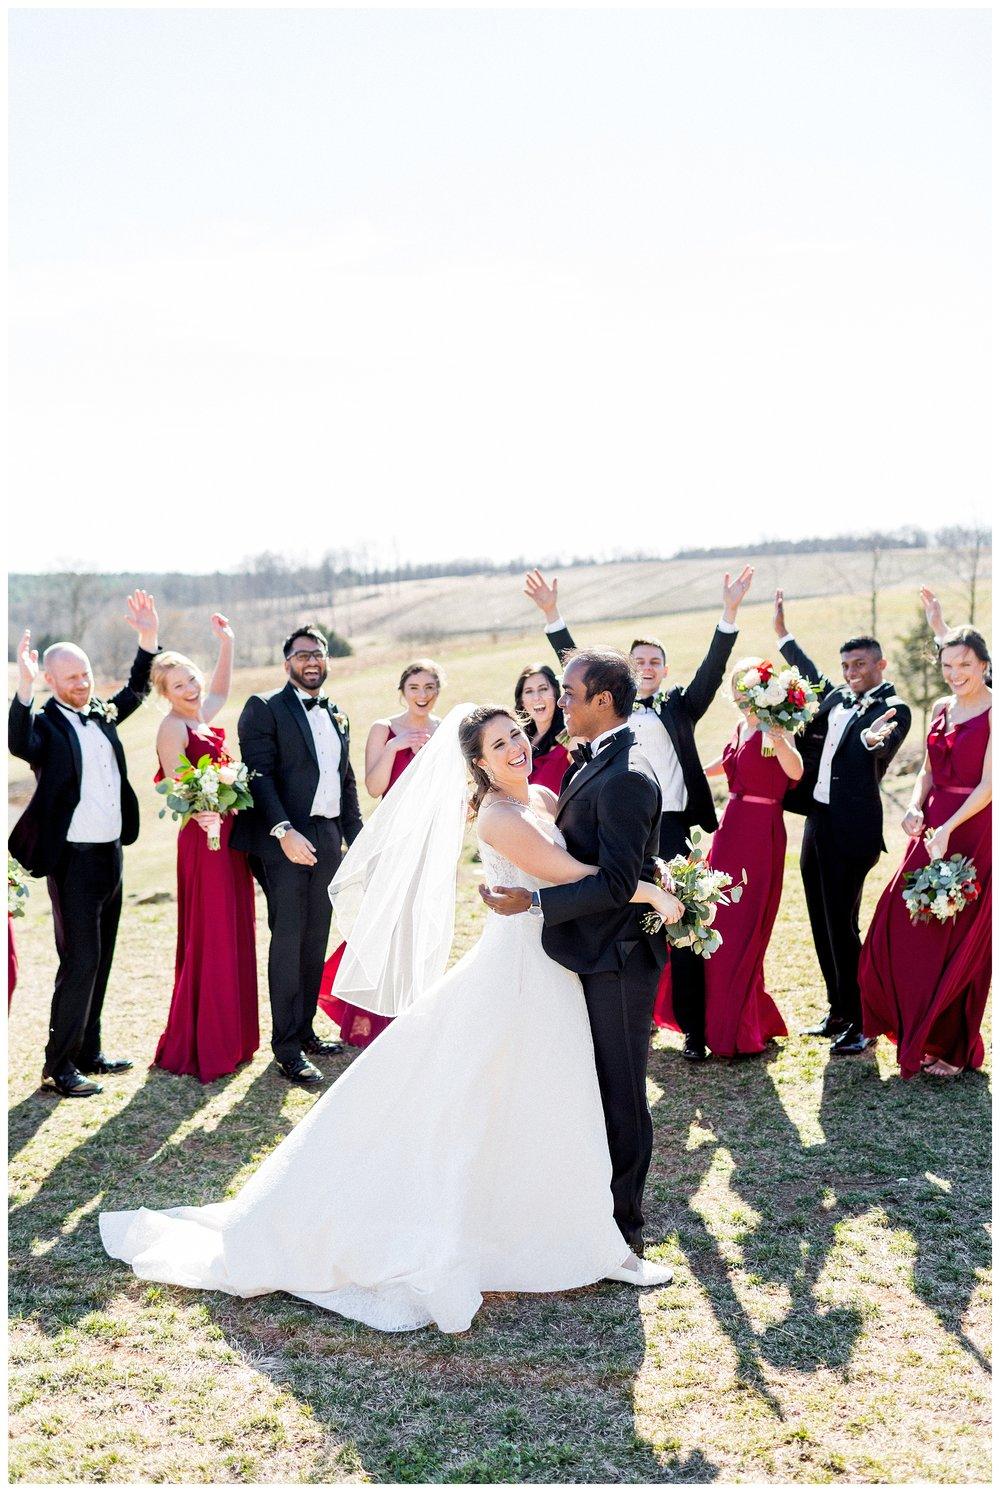 Stone Tower Winery Wedding | Virginia Winter Wedding | VA Wedding Photographer Kir Tuben_0067.jpg